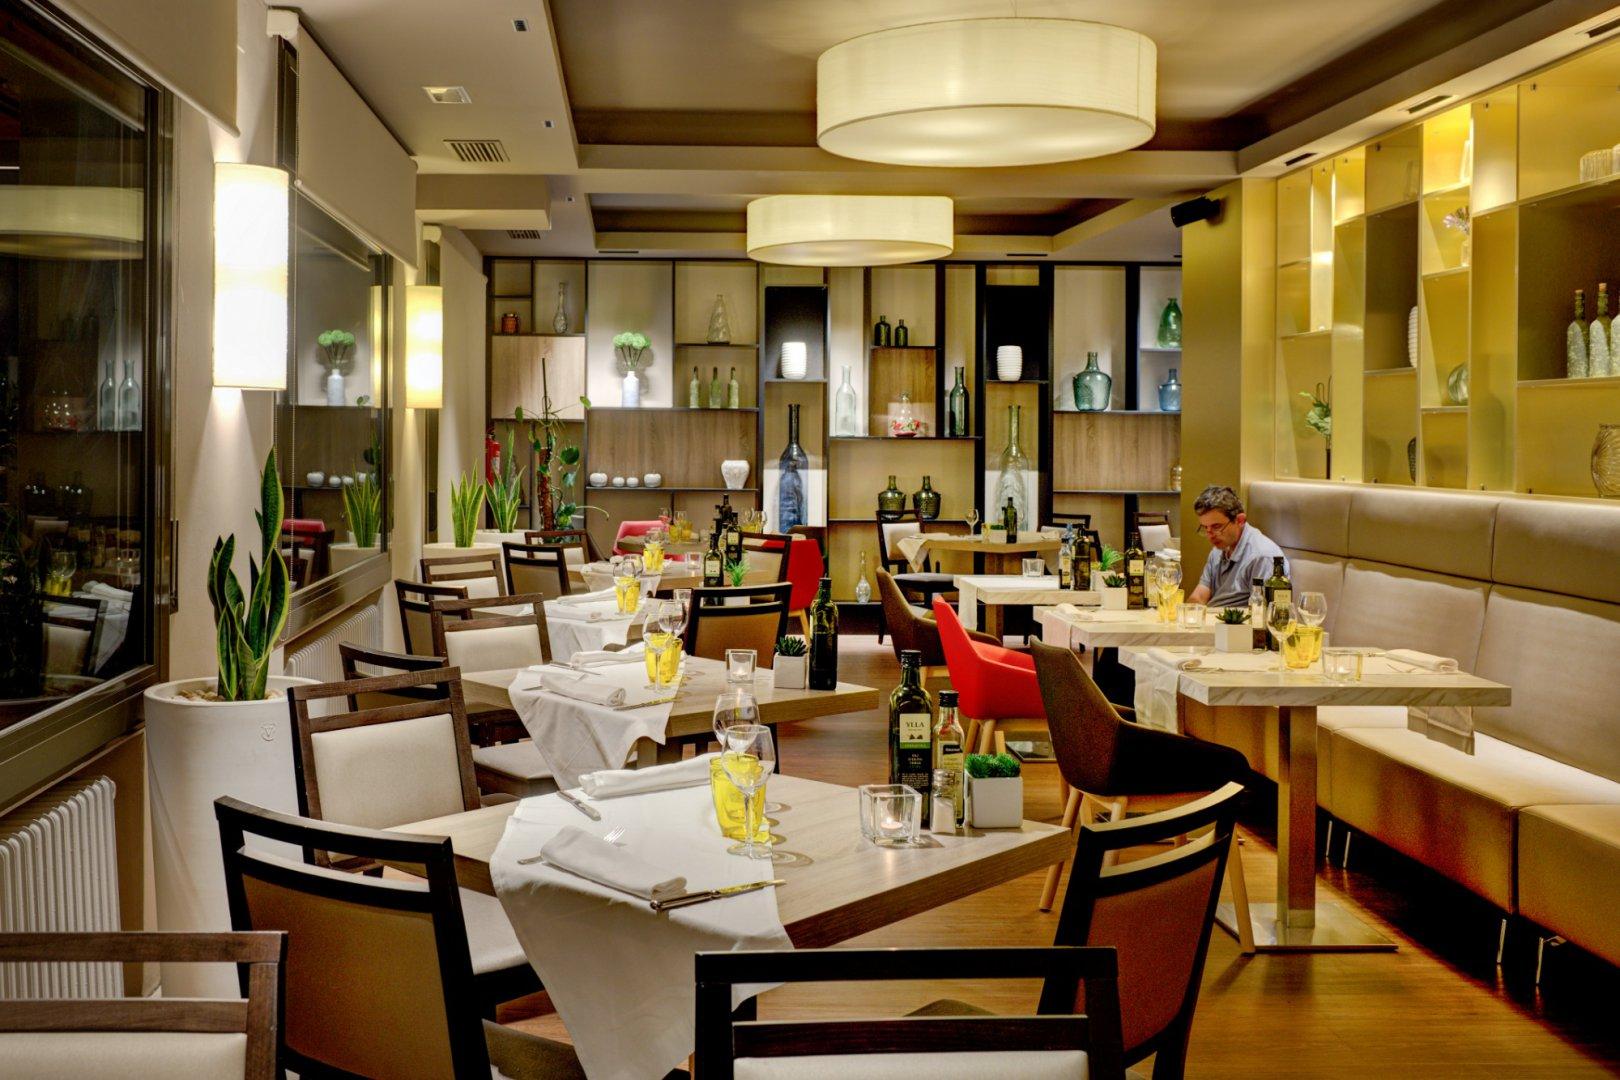 https://www.restaurantronda.com/imagecache/uploads_images_paginas_home_1620x1080_c_dsc-8199-copia.jpg